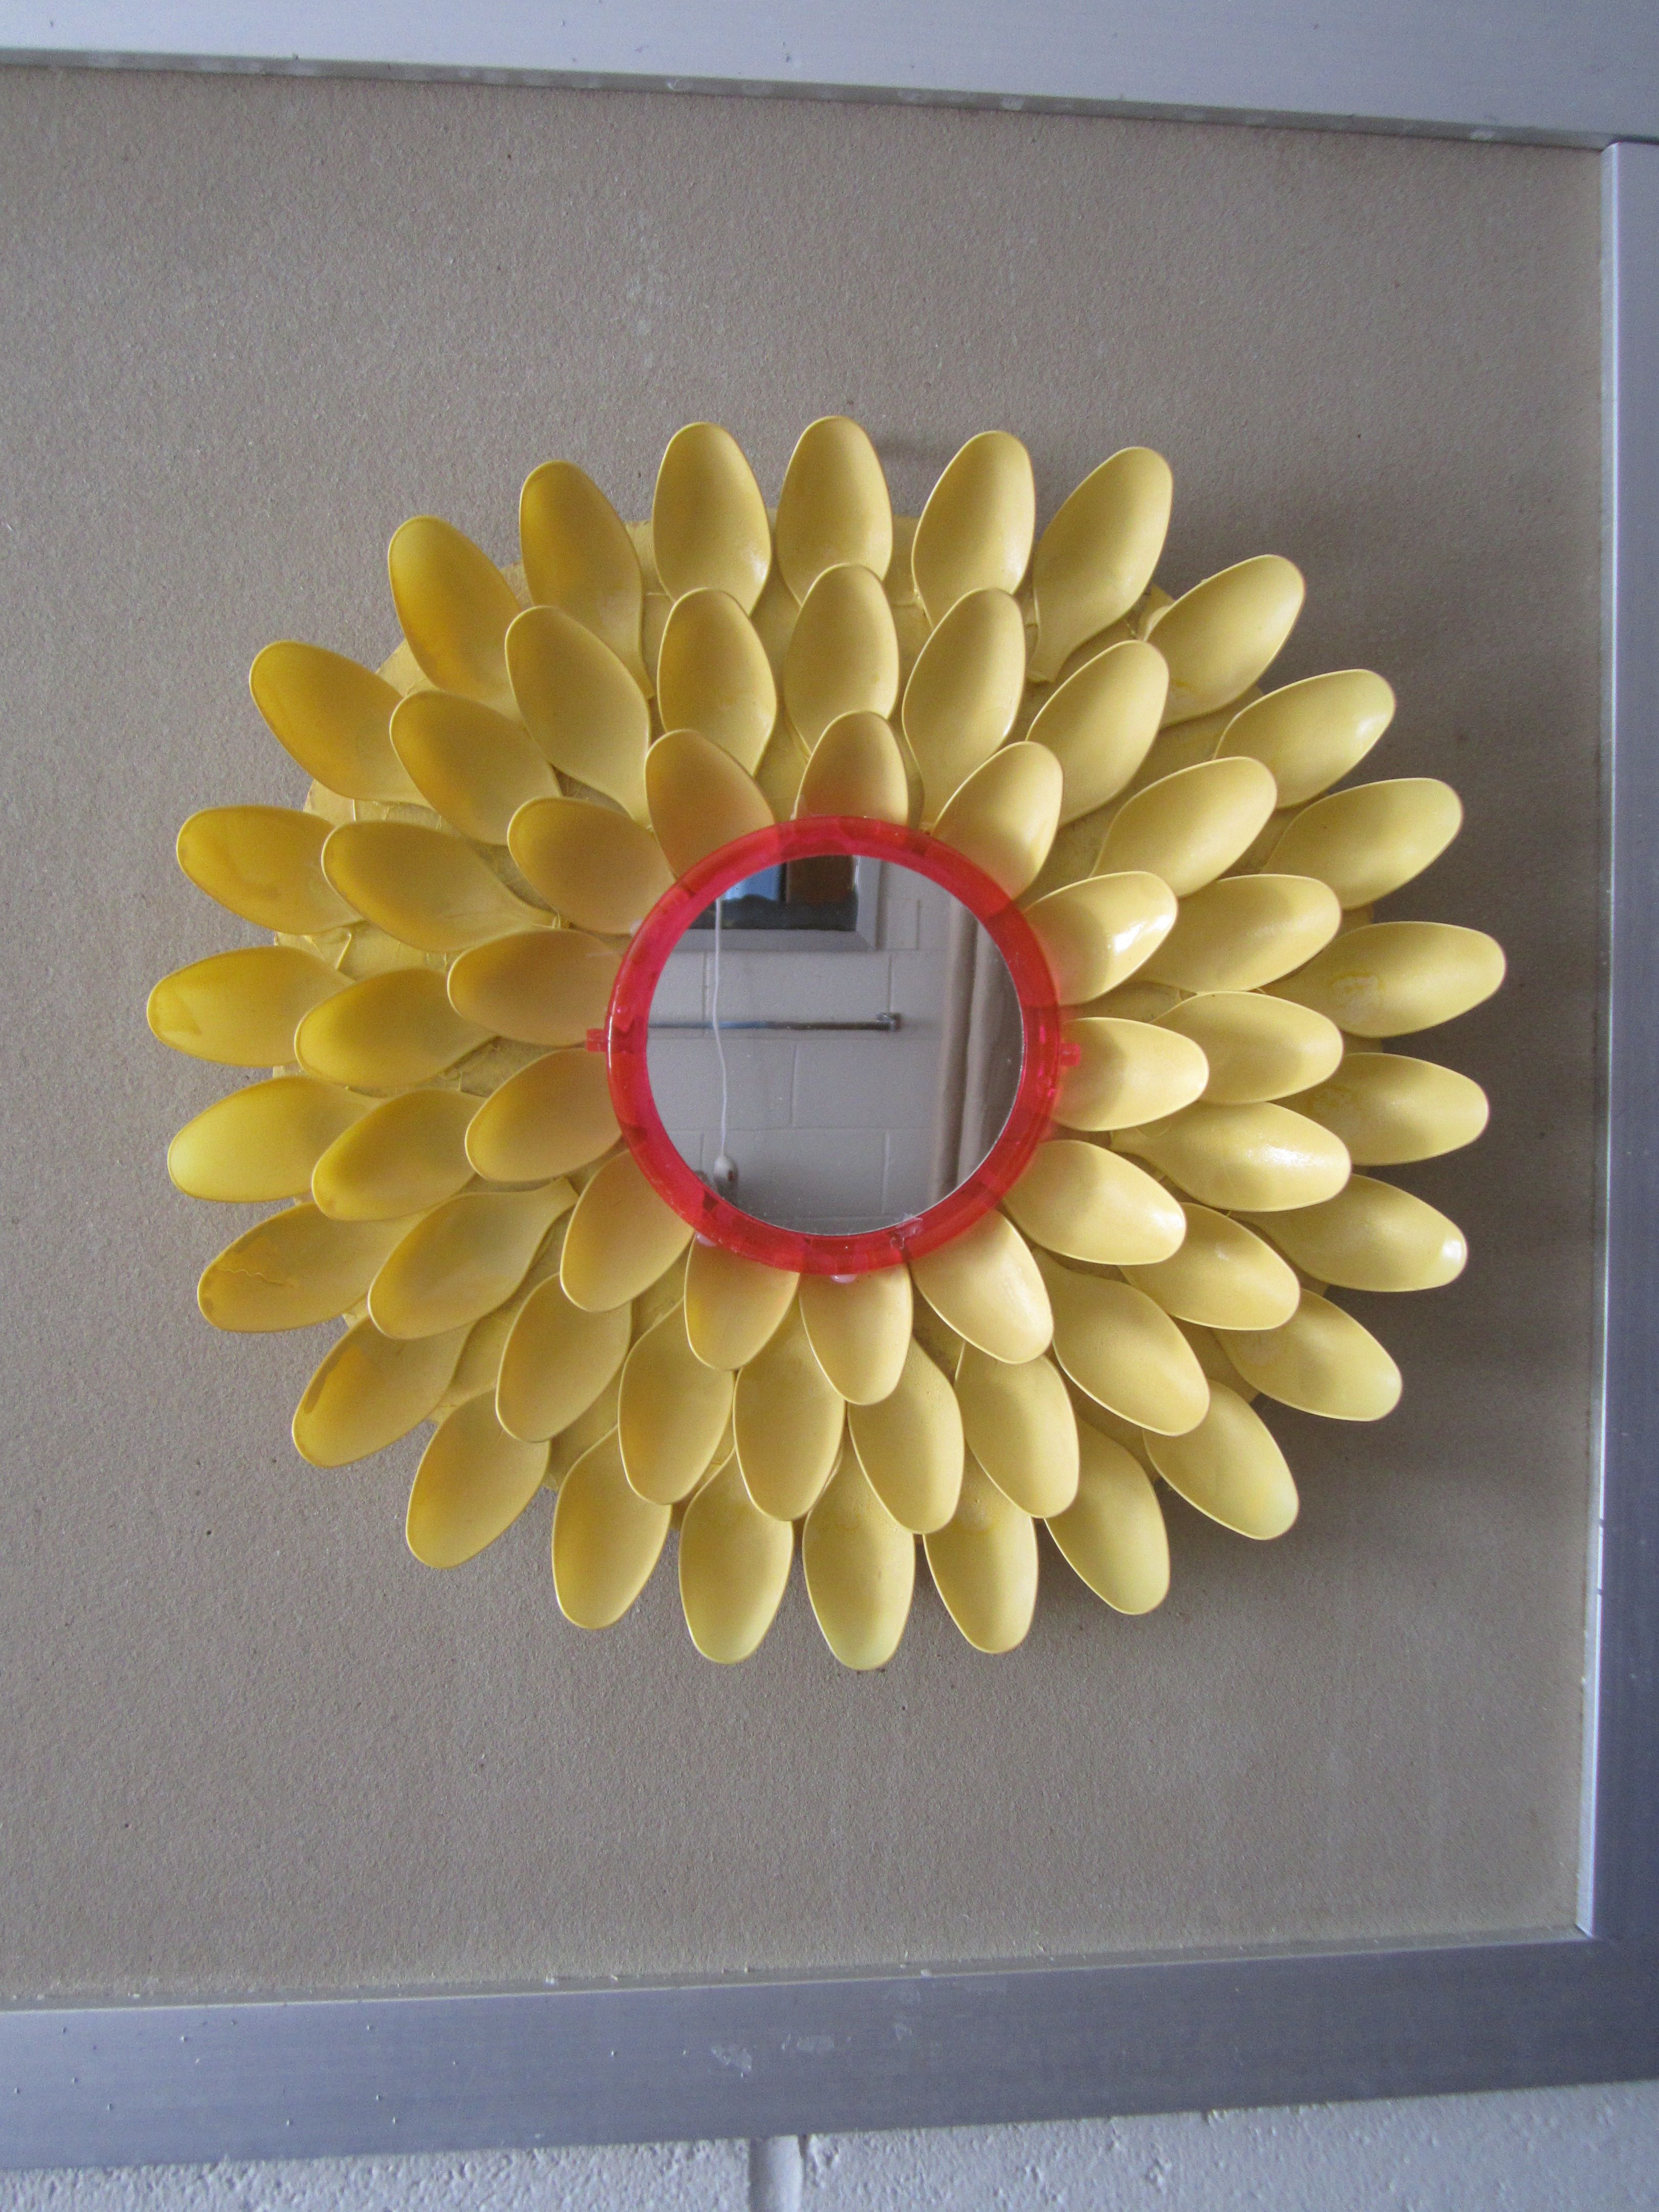 20 cheap simple dollar store crafts flower mirror diy drawers 20 cheap simple dollar store crafts the craftiest couple izmirmasajfo Choice Image